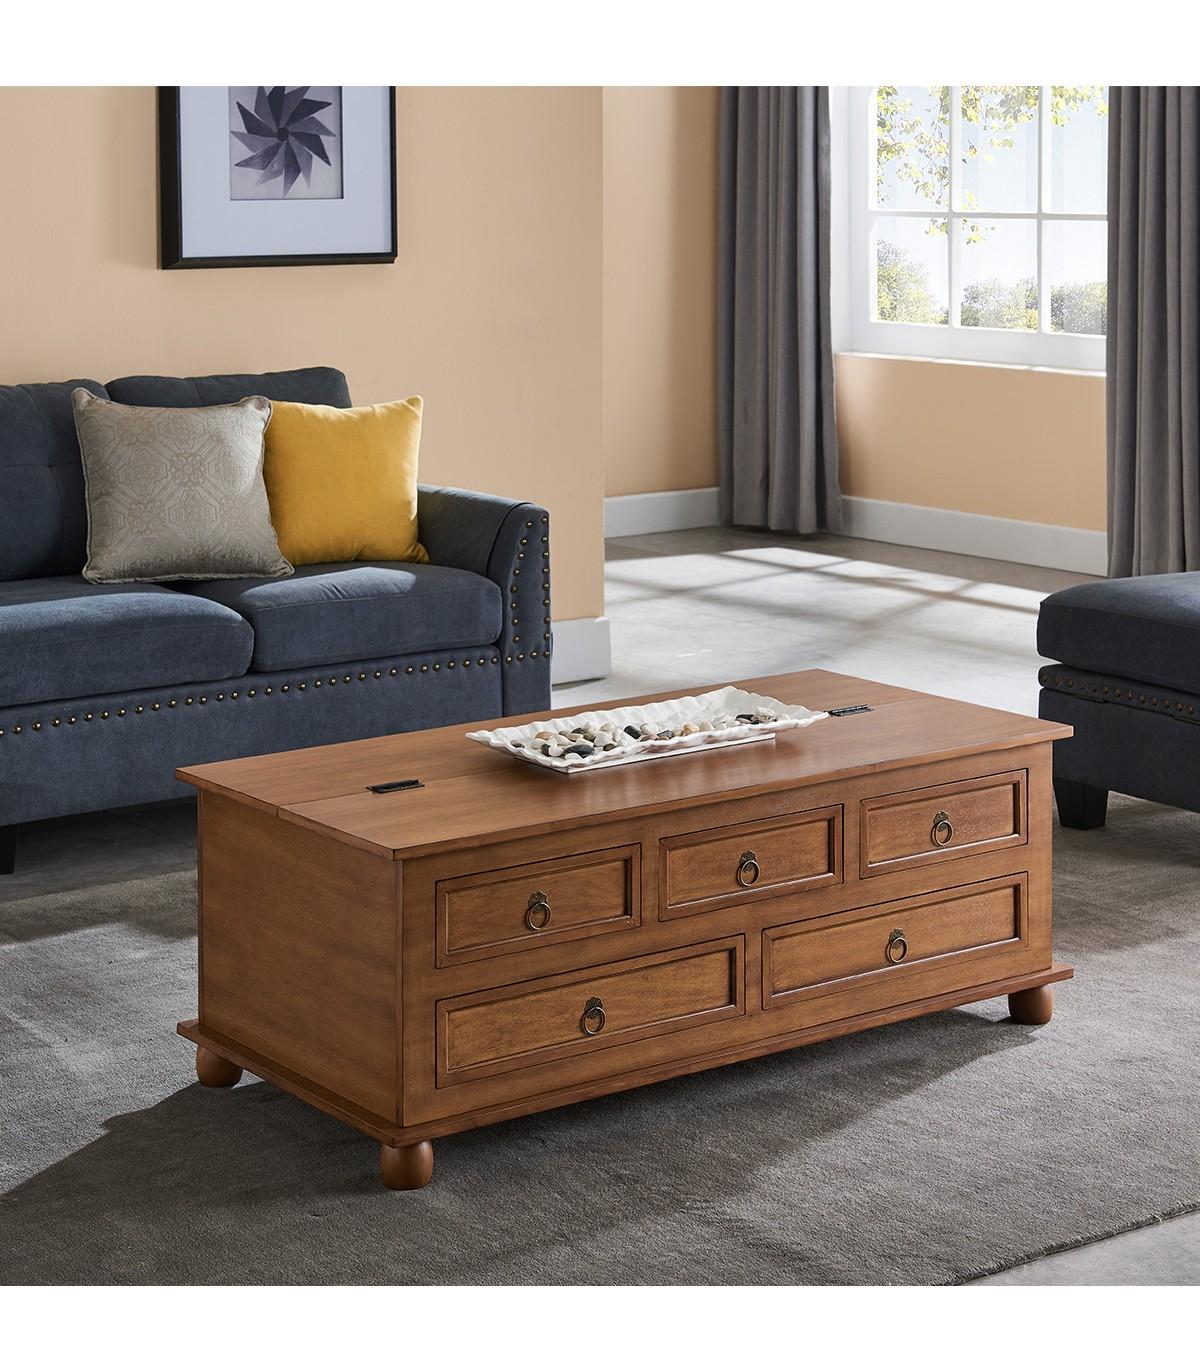 Table basse coffre placage frêne avec tiroirs - Marron